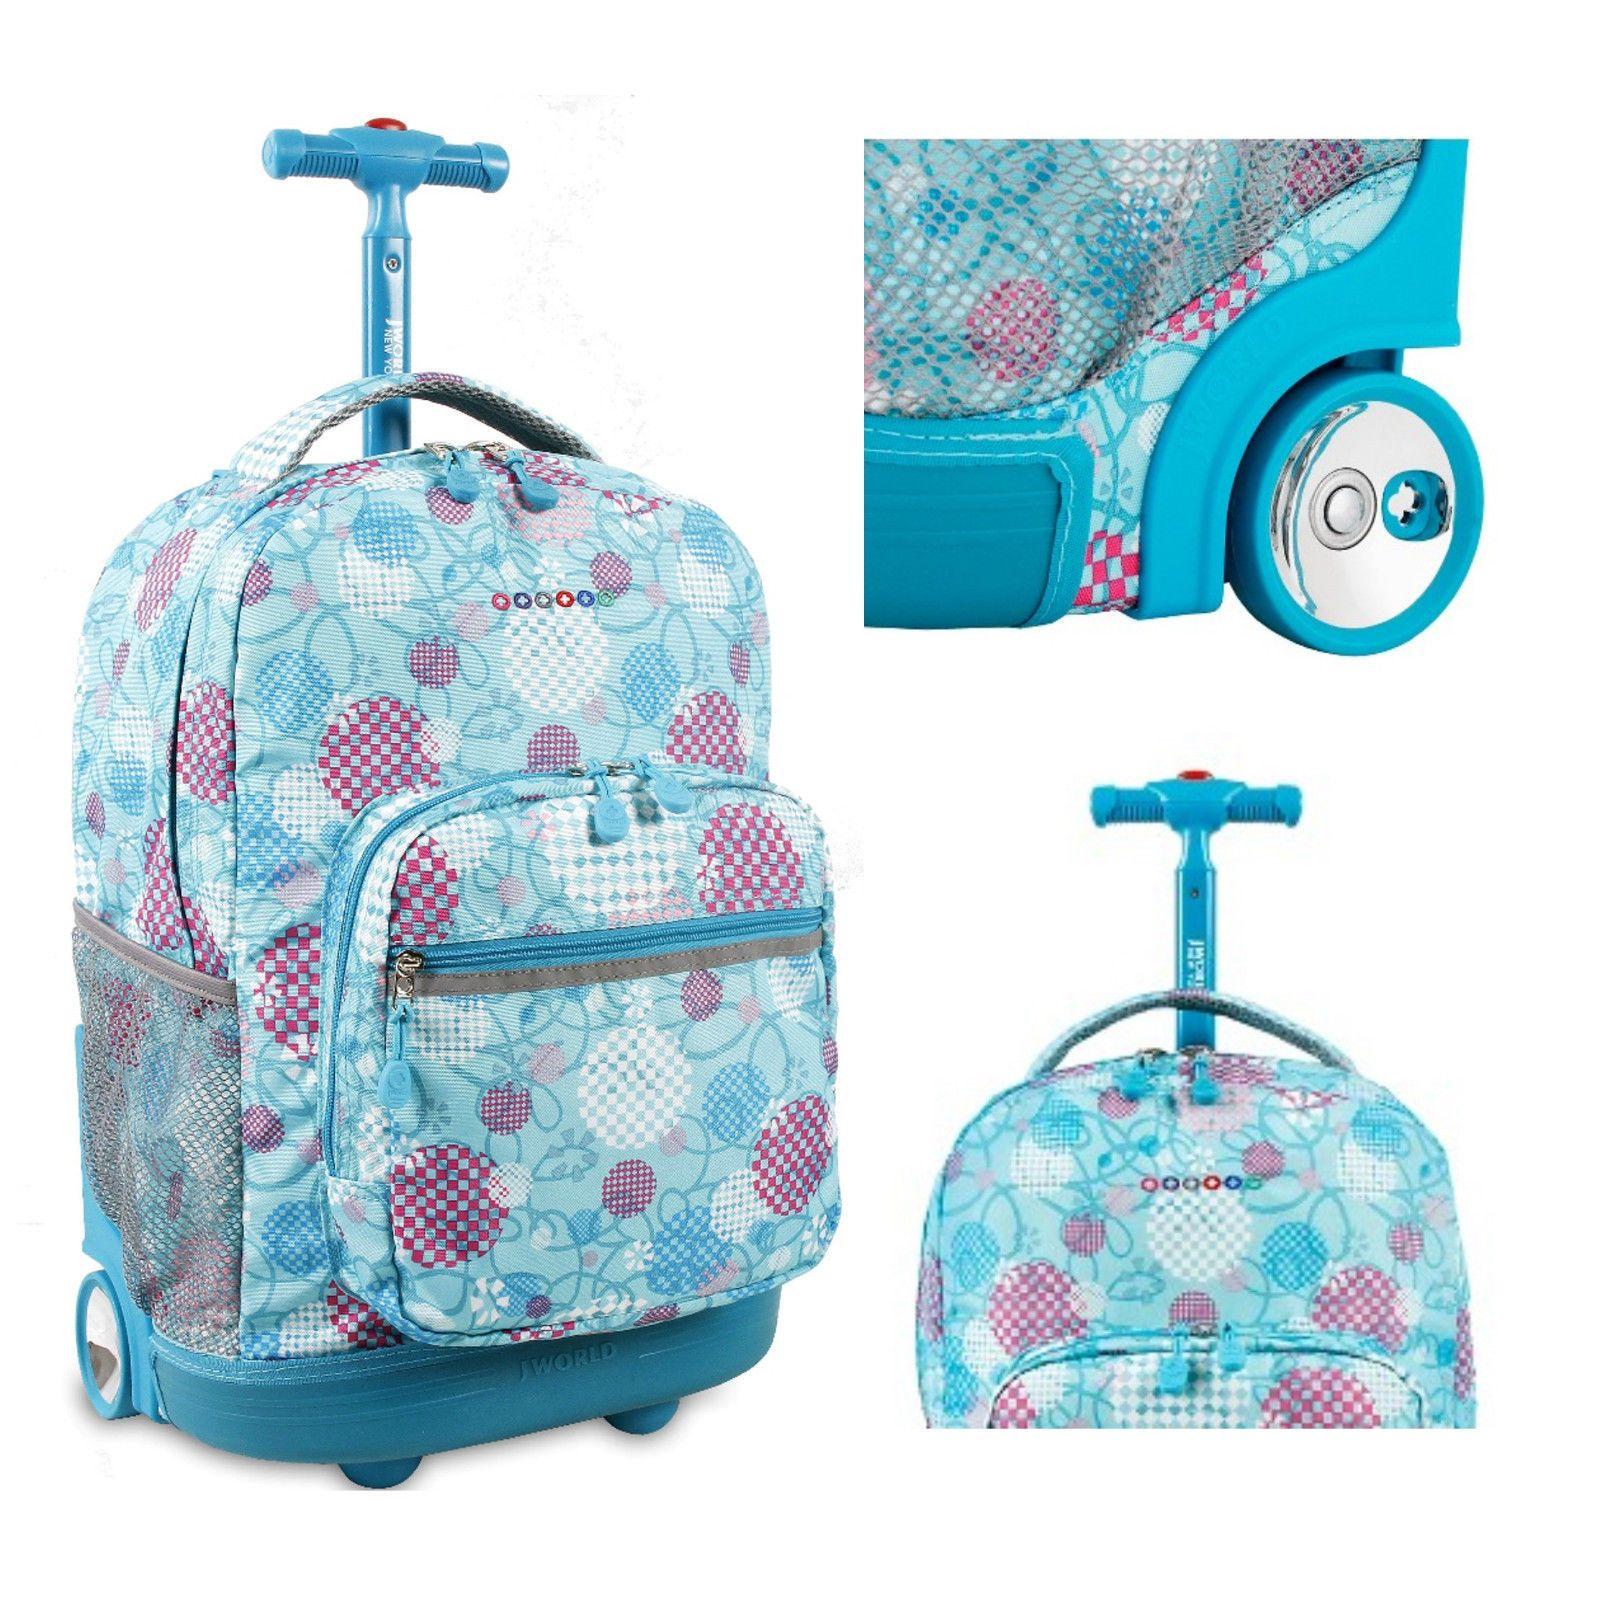 Girls Rolling Backpack Wheeled Book Bag School Kids Travel